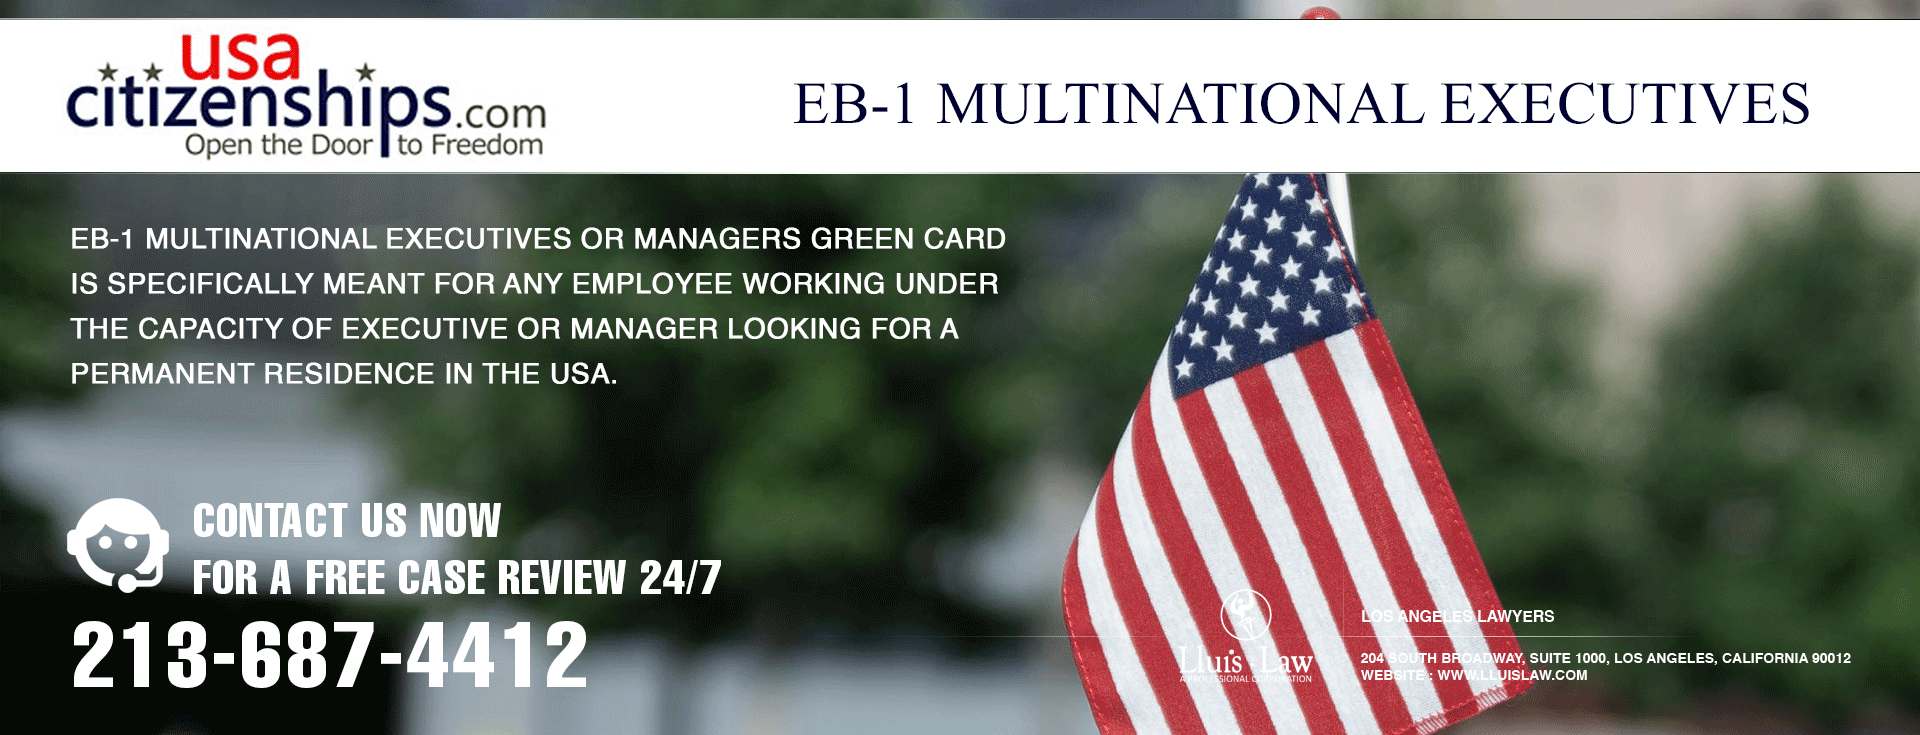 eb 1 multinational executive